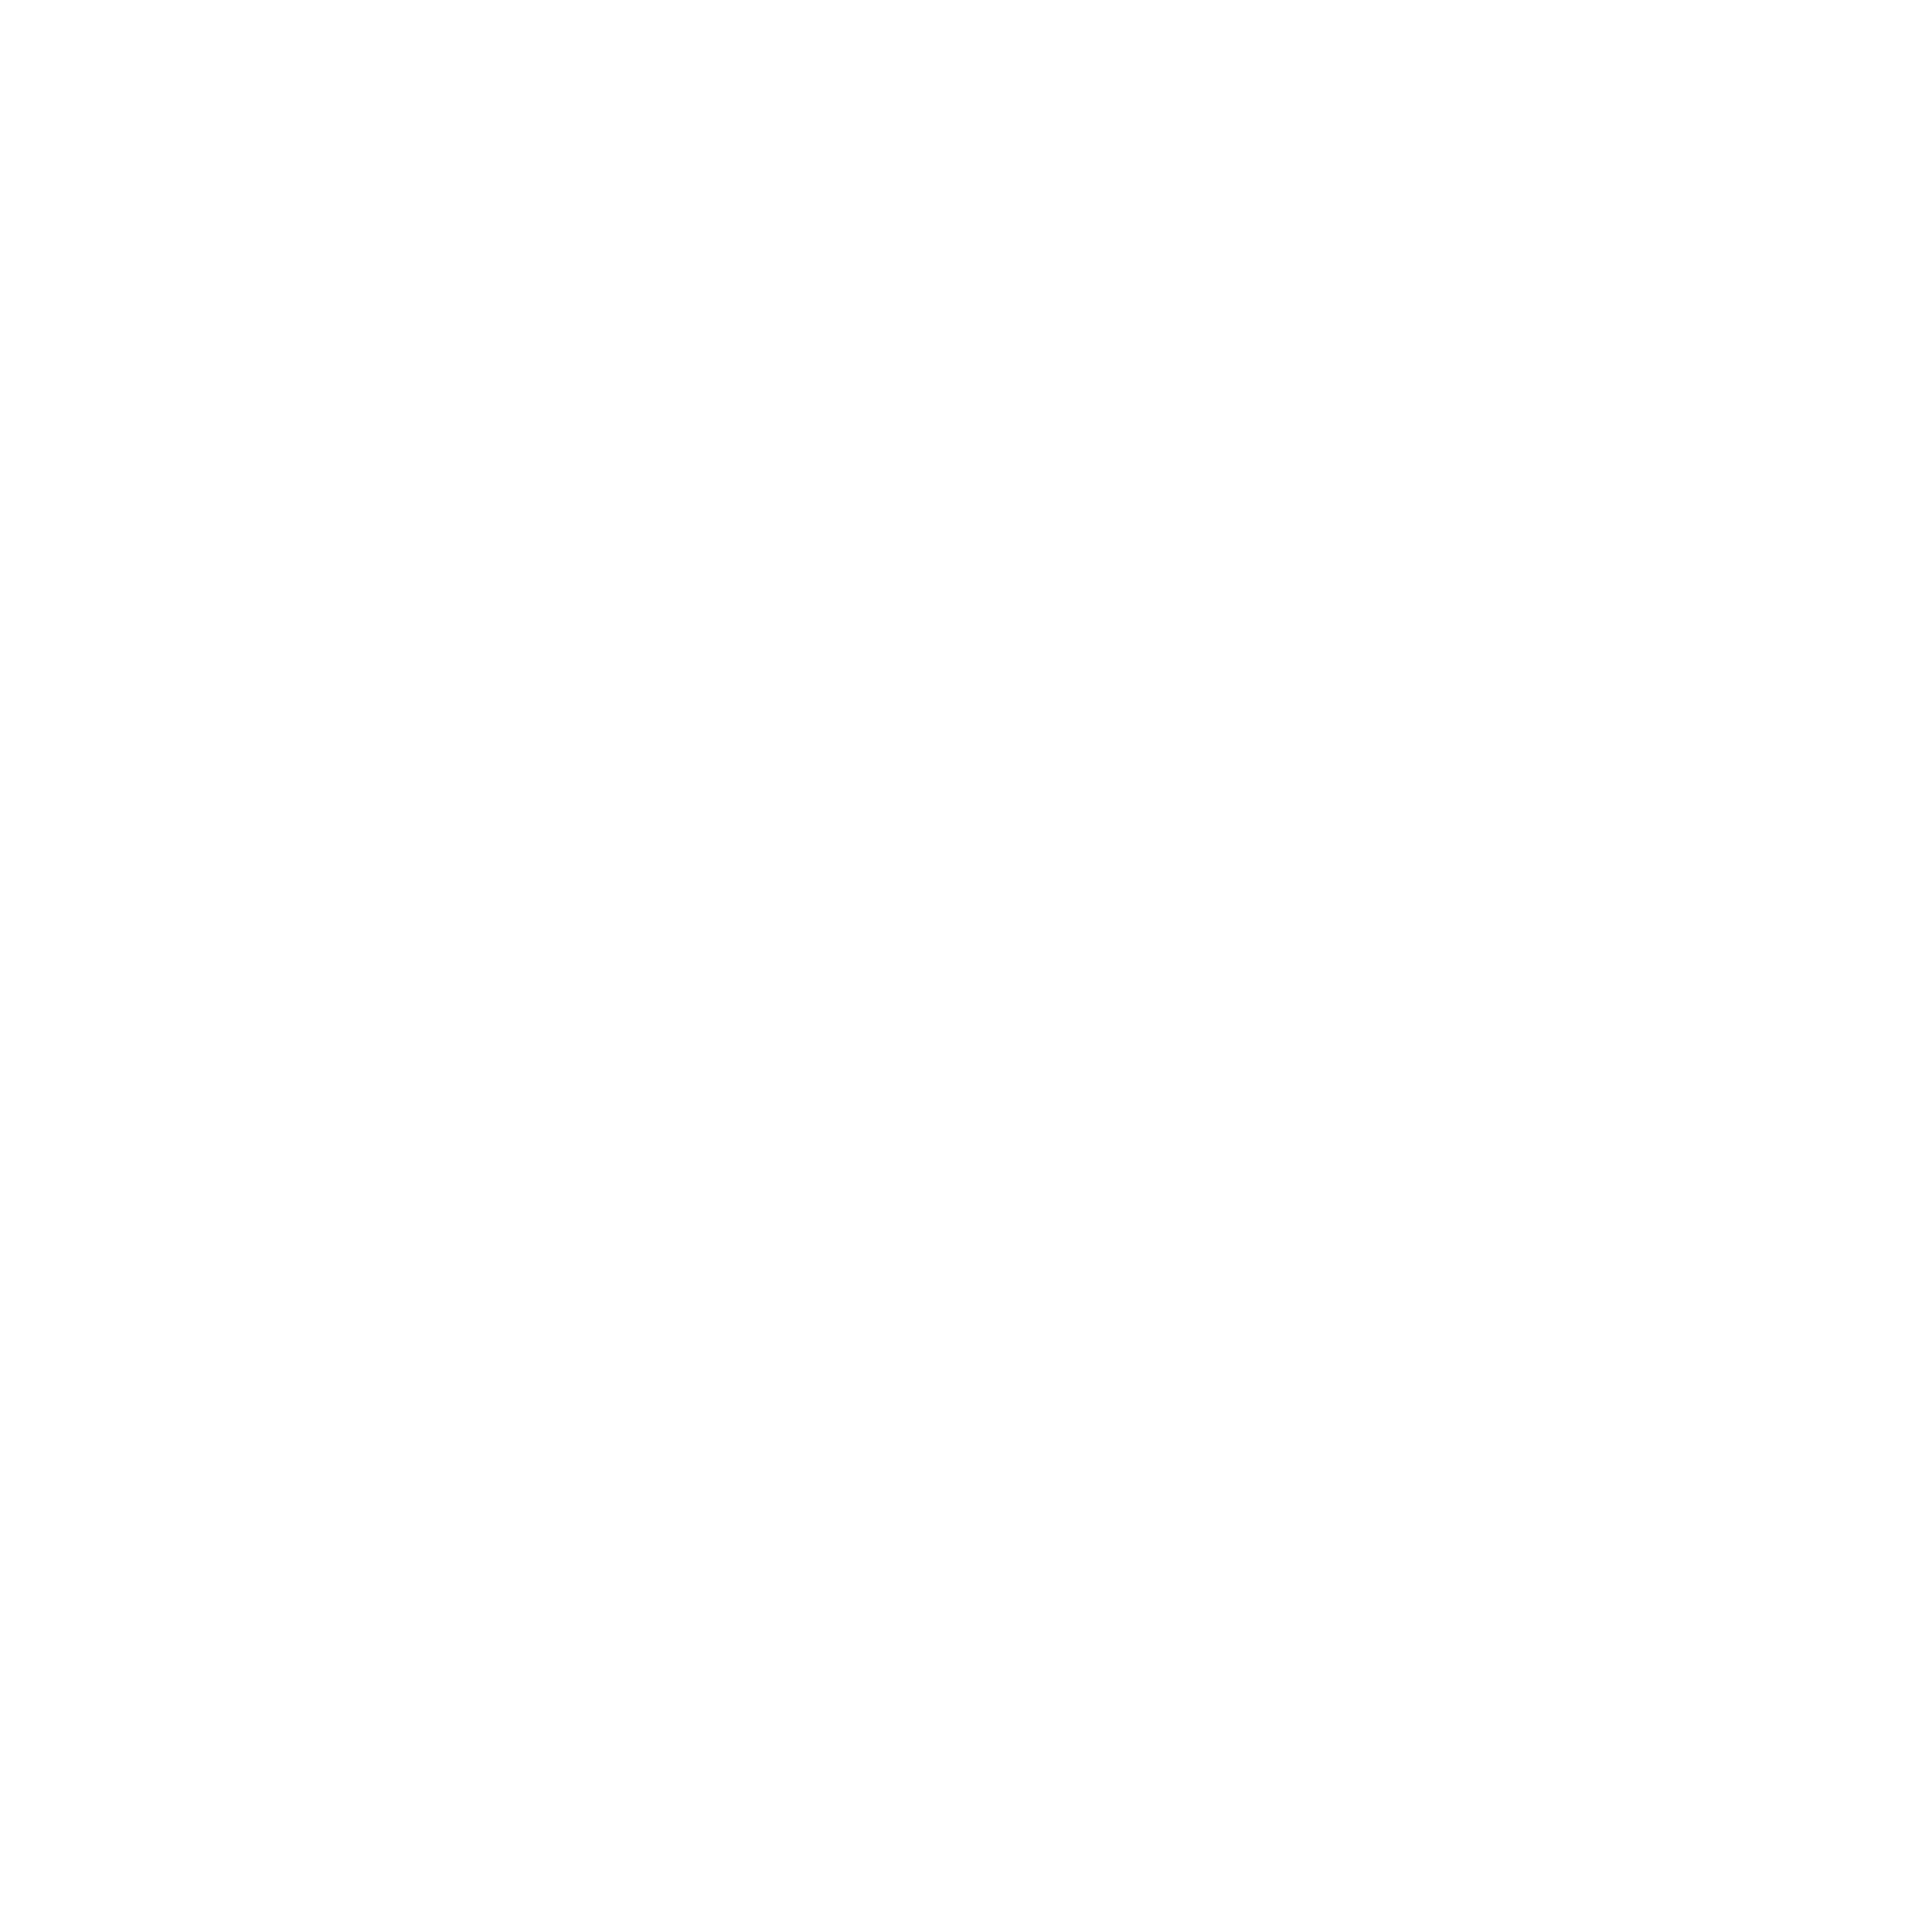 Horus Esports team logo